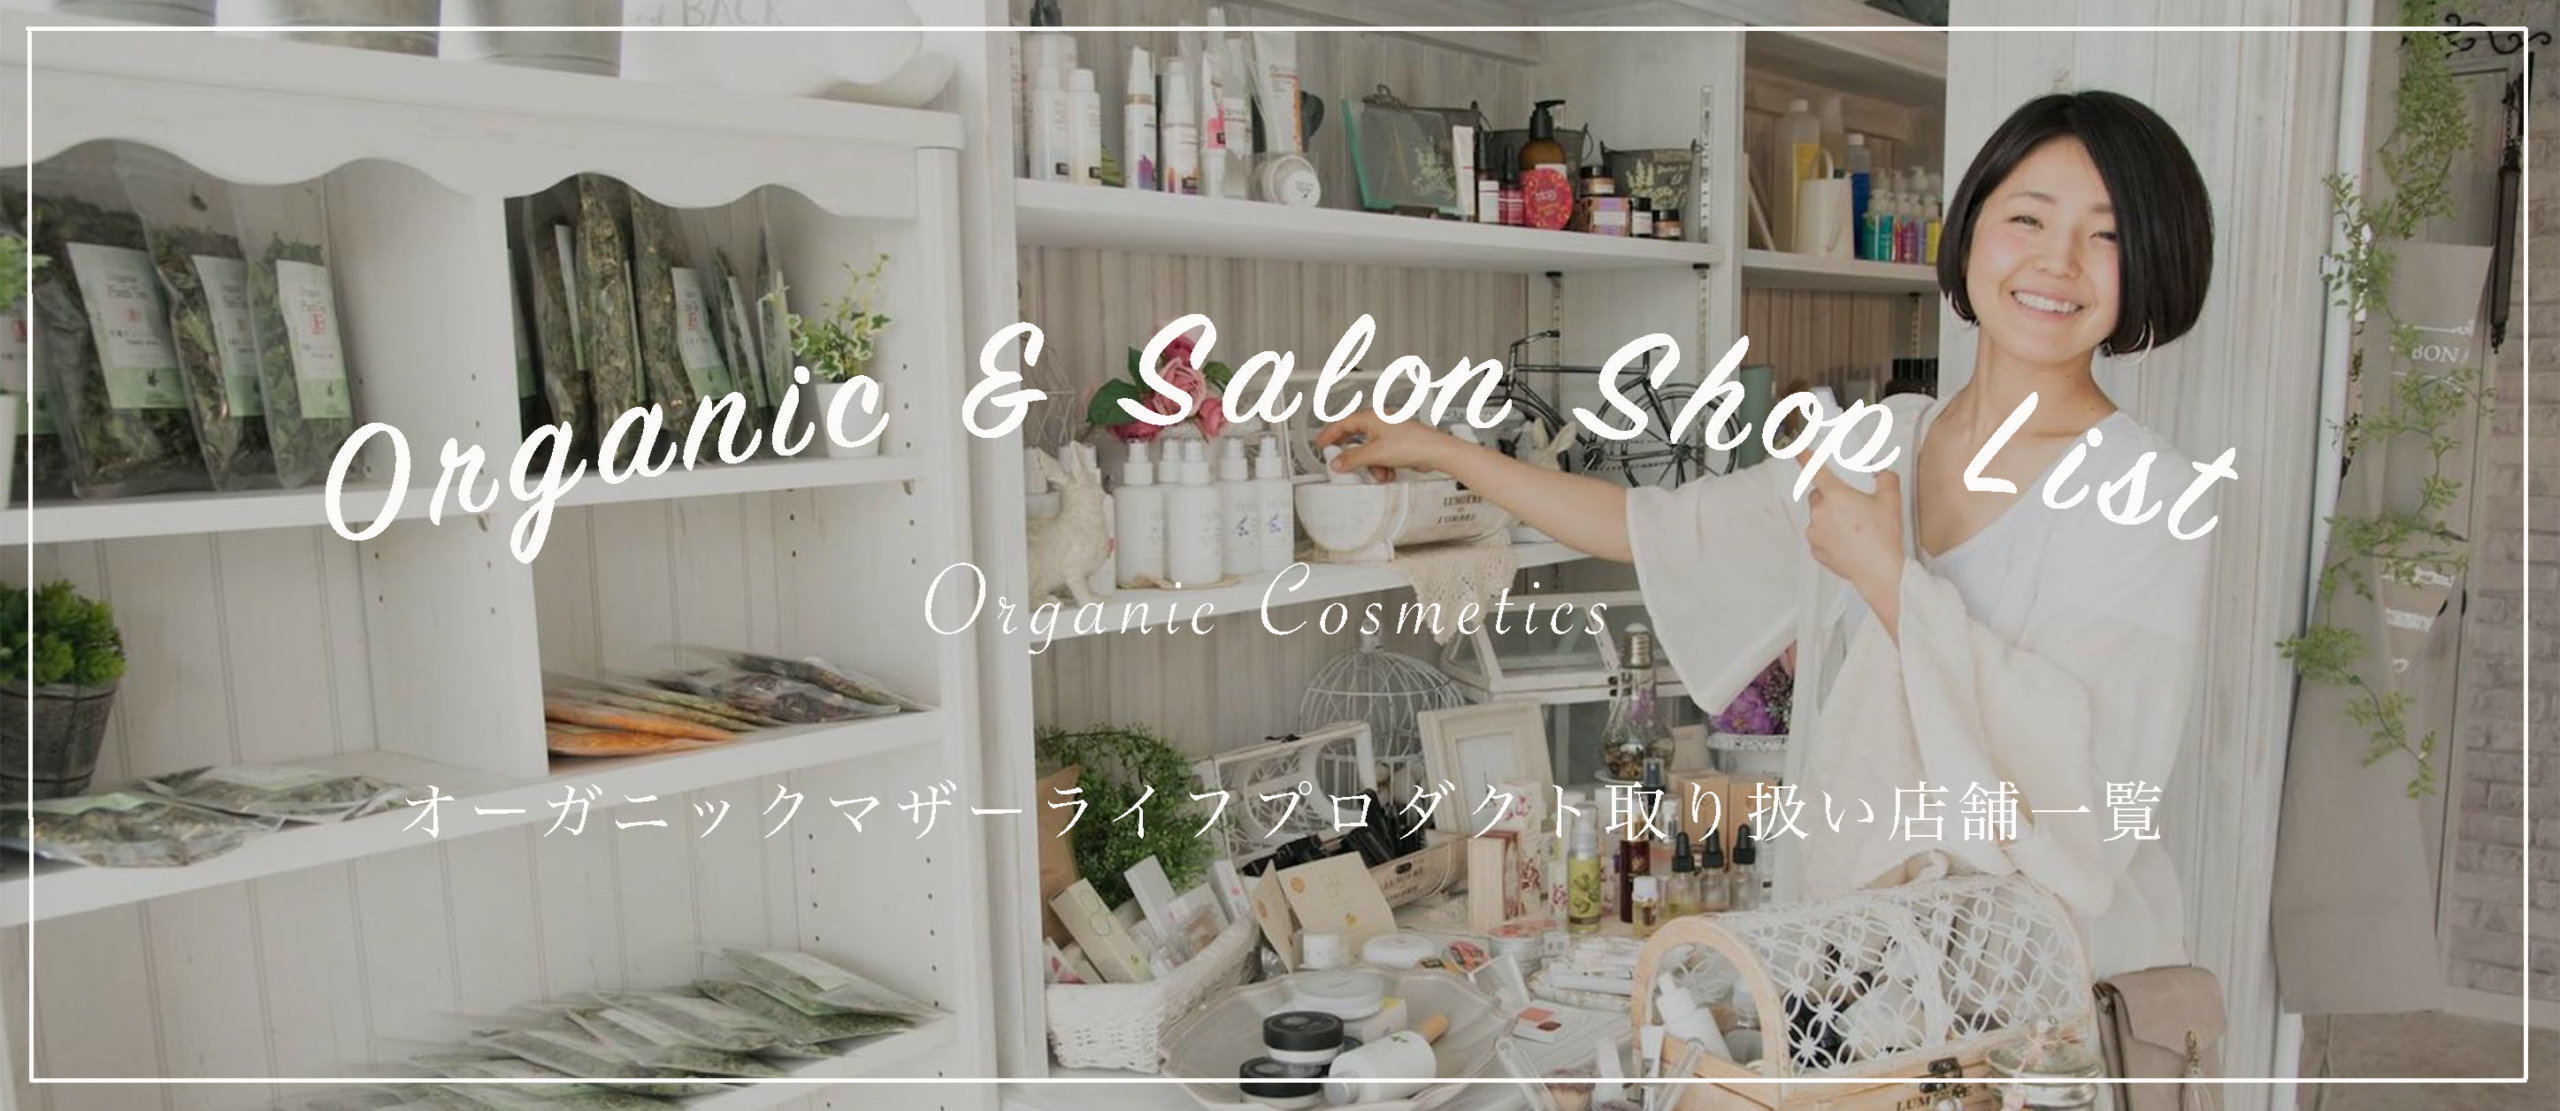 Organic & Salon Shop List